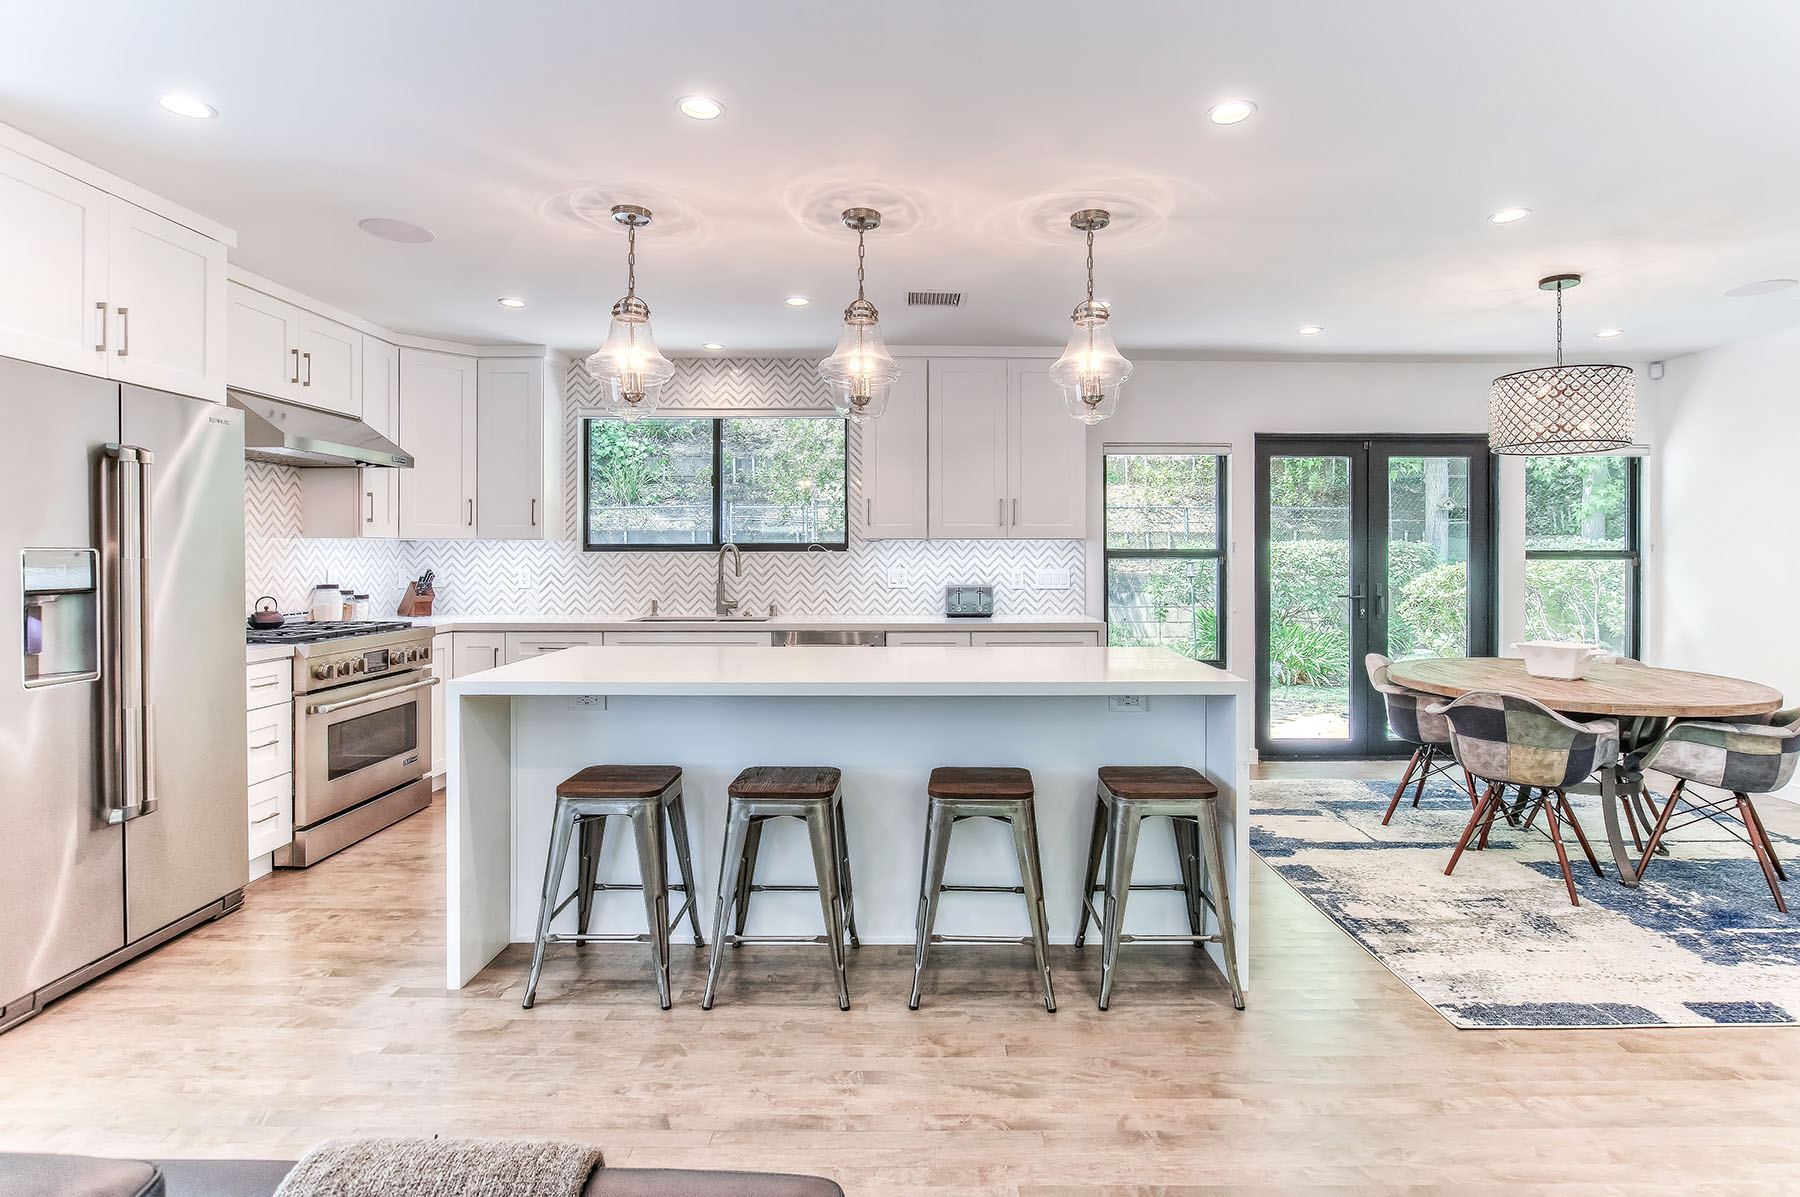 studio city complete remodel kitchen and dining room open floor small.jpg